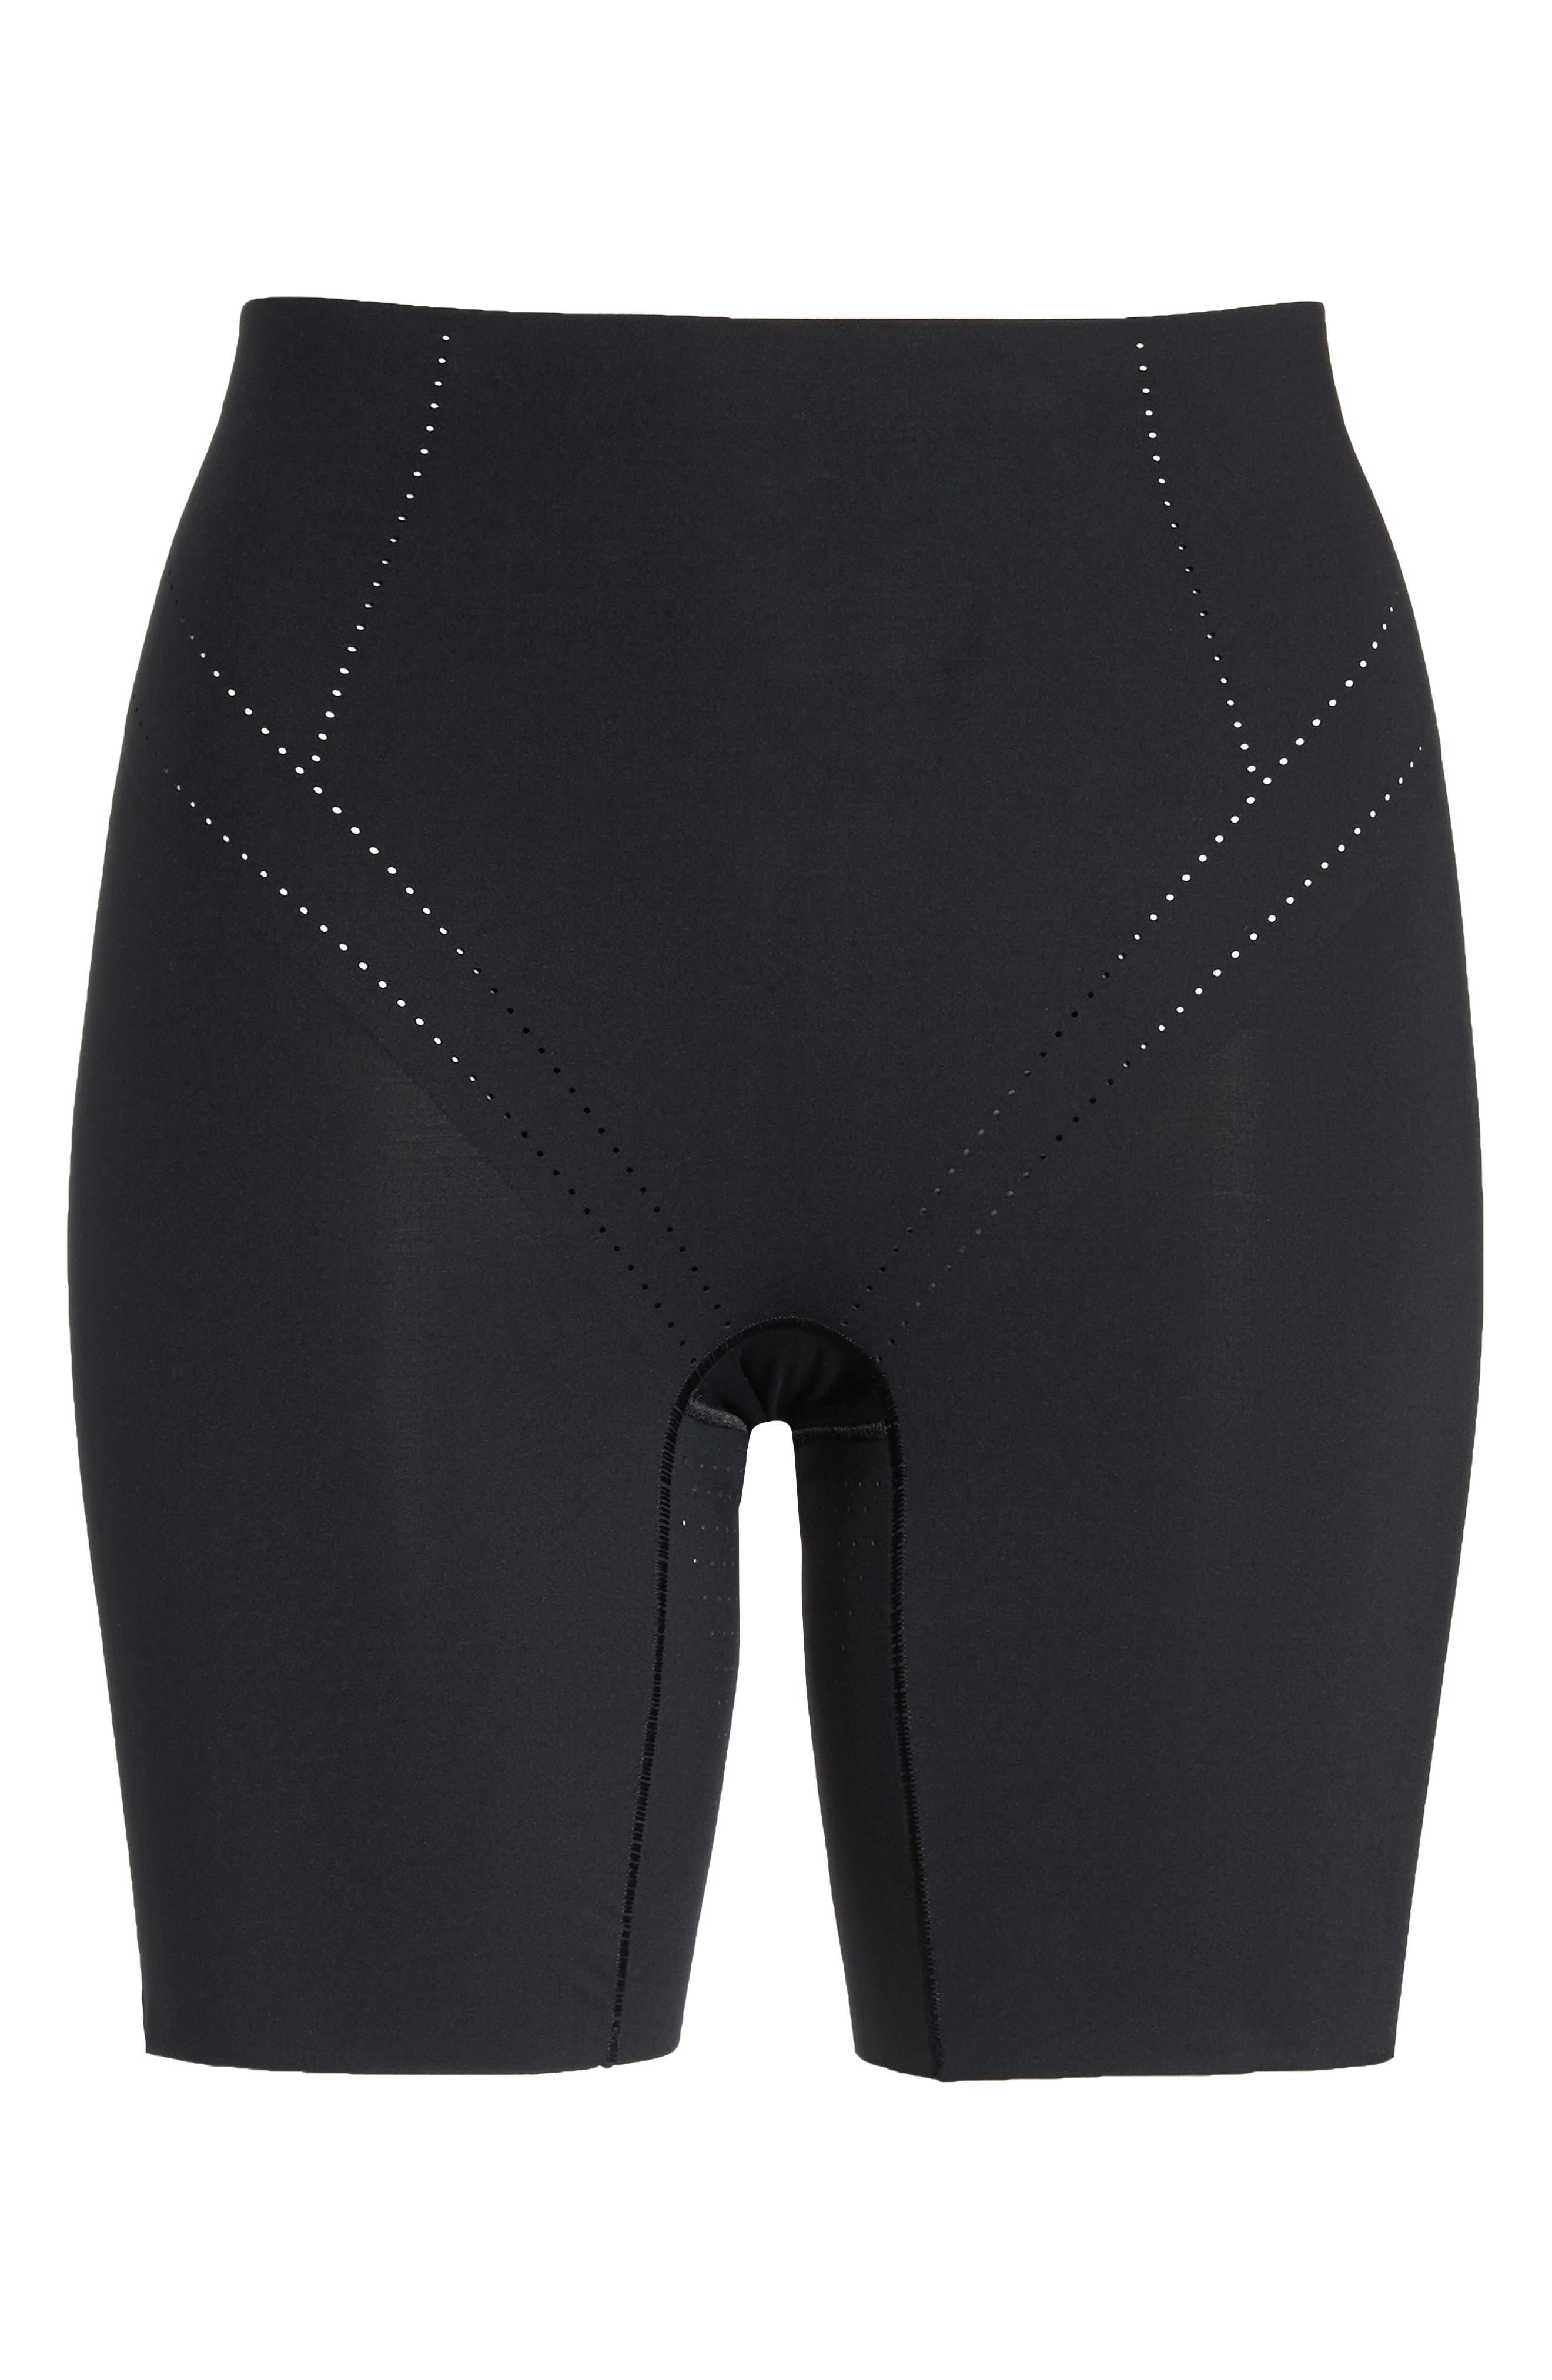 Shape Air Shaper Shorts,                             Alternate thumbnail 4, color,                             Black